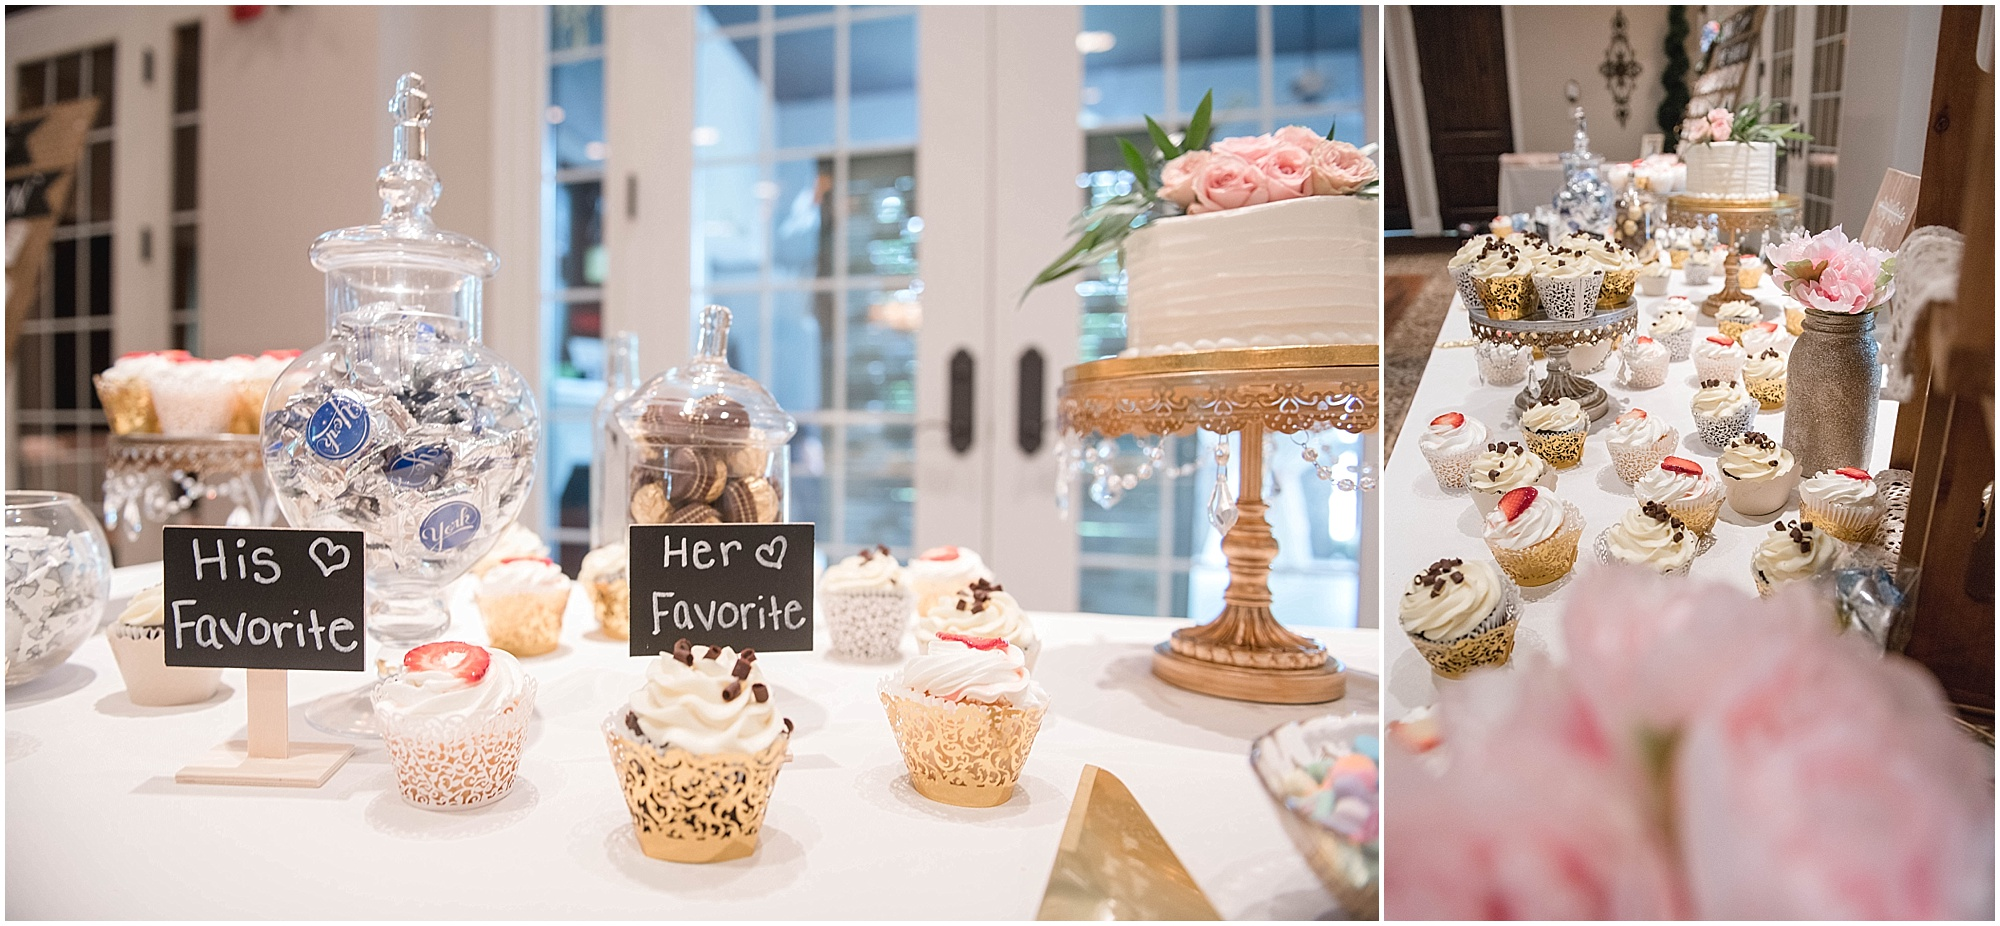 Adivas Photography Luxury Boutique Wedding Service_0821.jpg